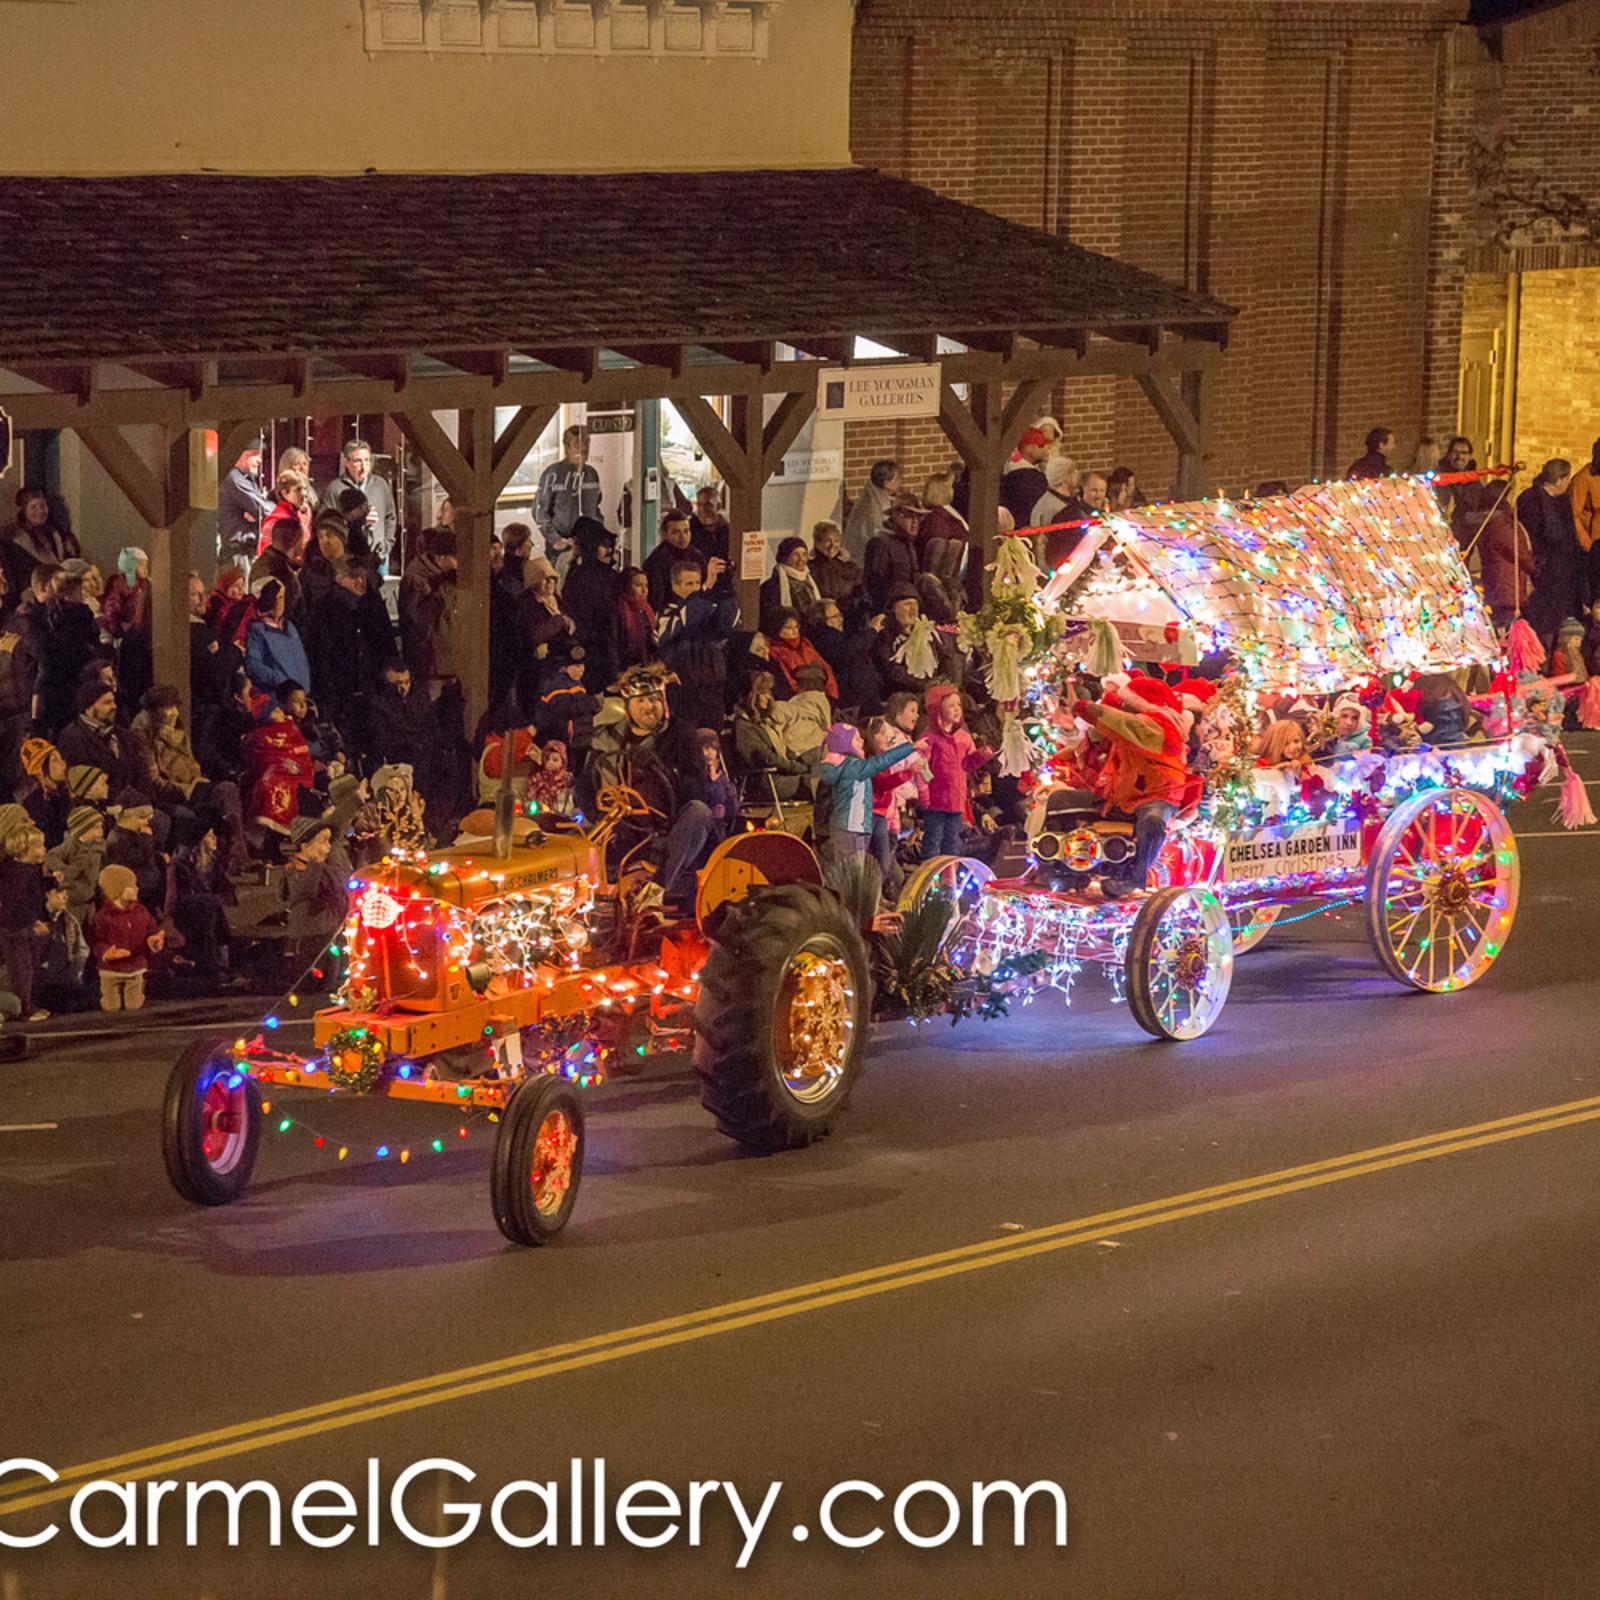 Lighted tractor parade 6 c1ljlr